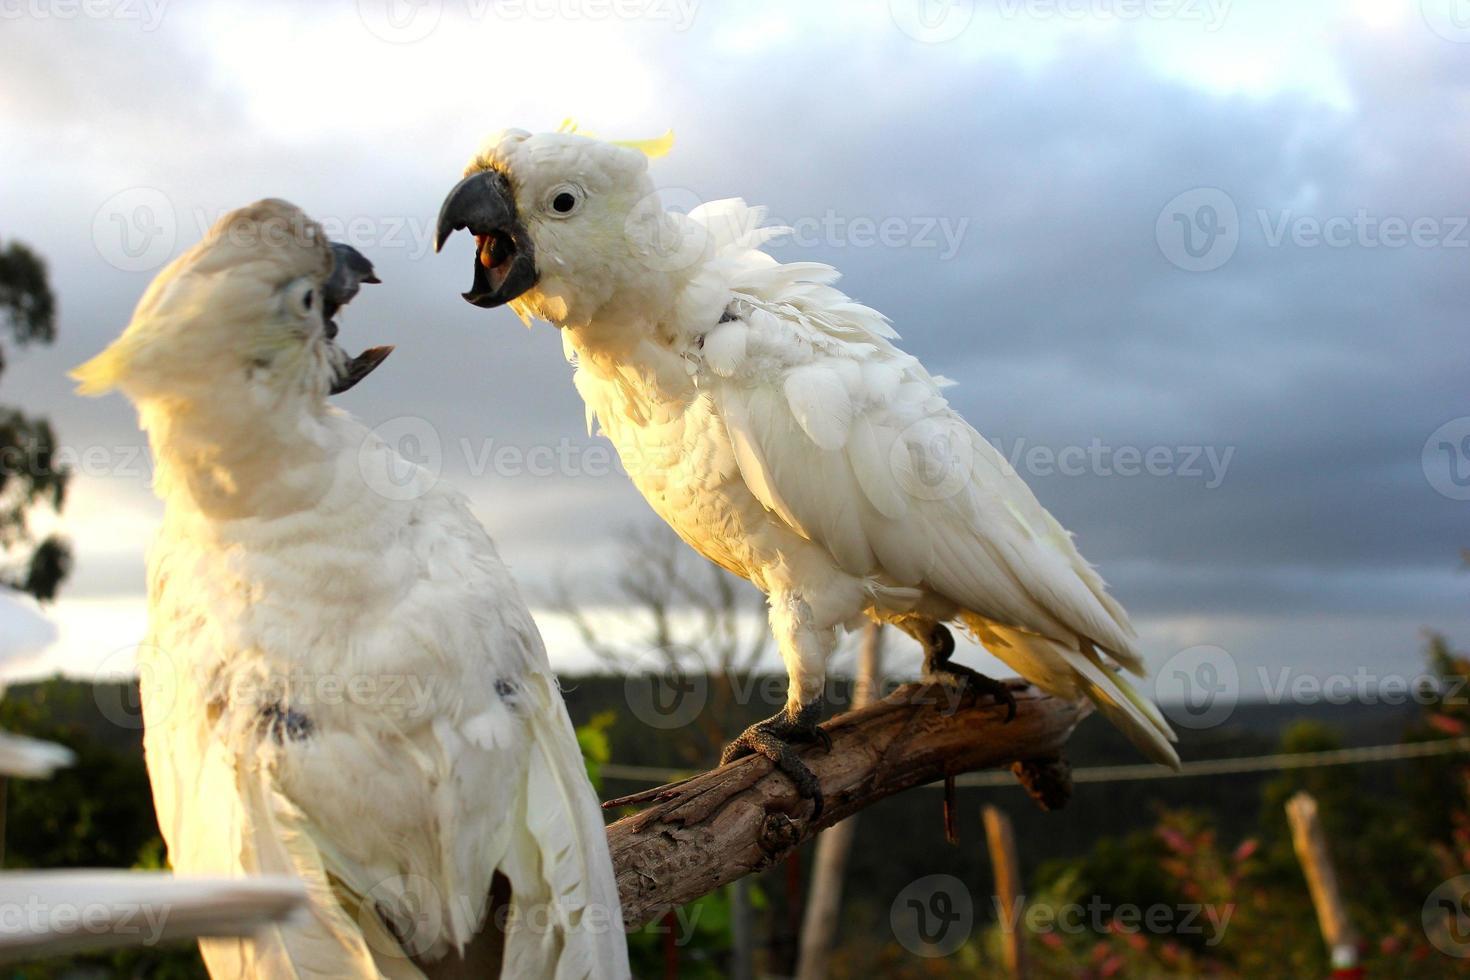 Sulphur-crested cockatoo photo